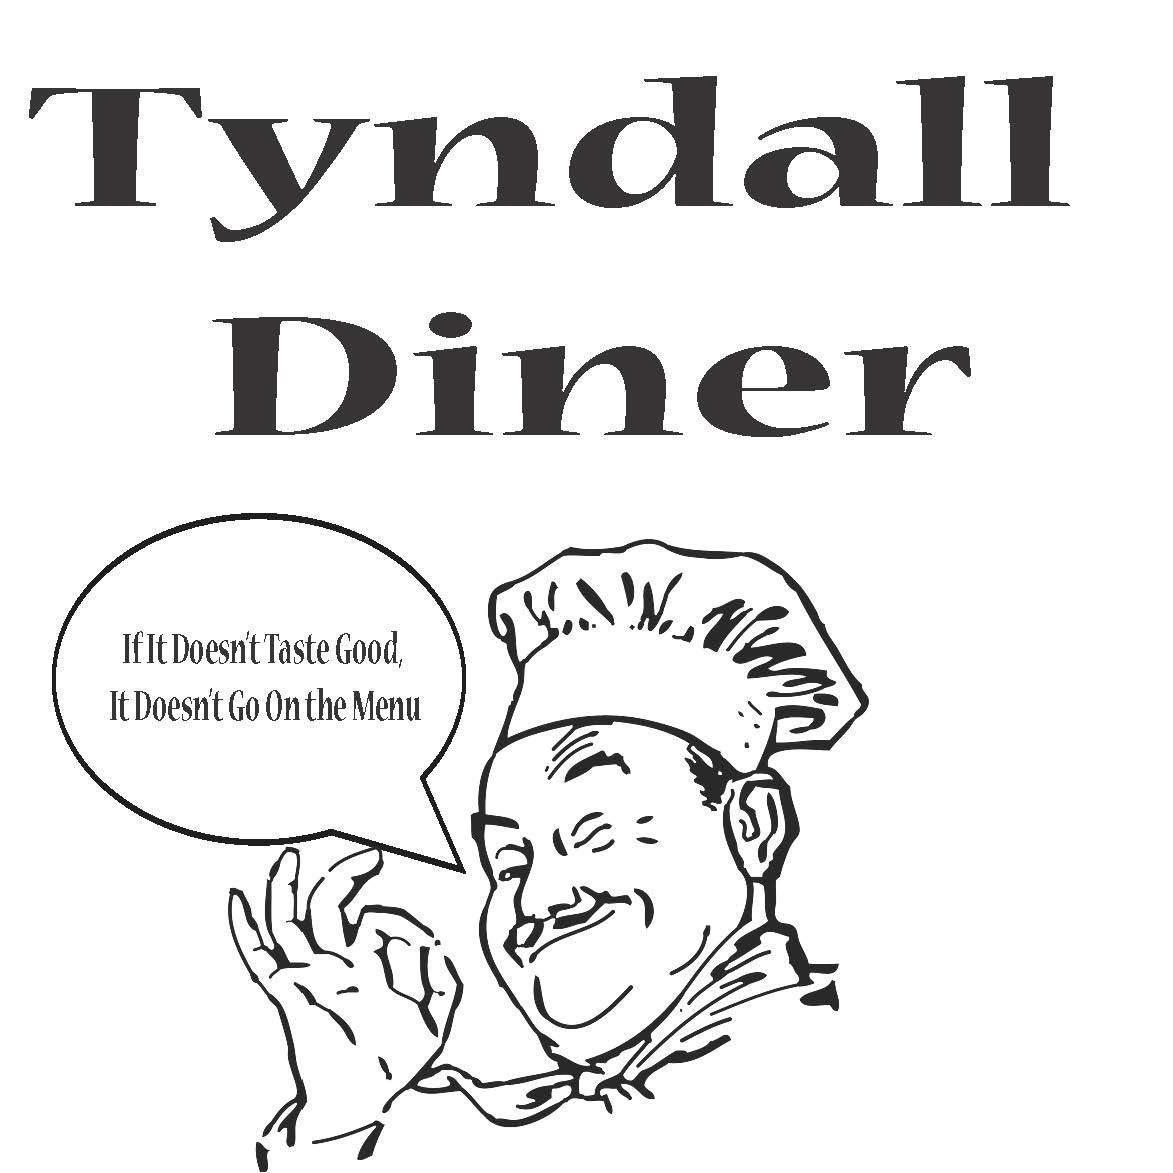 Tyndall Diner